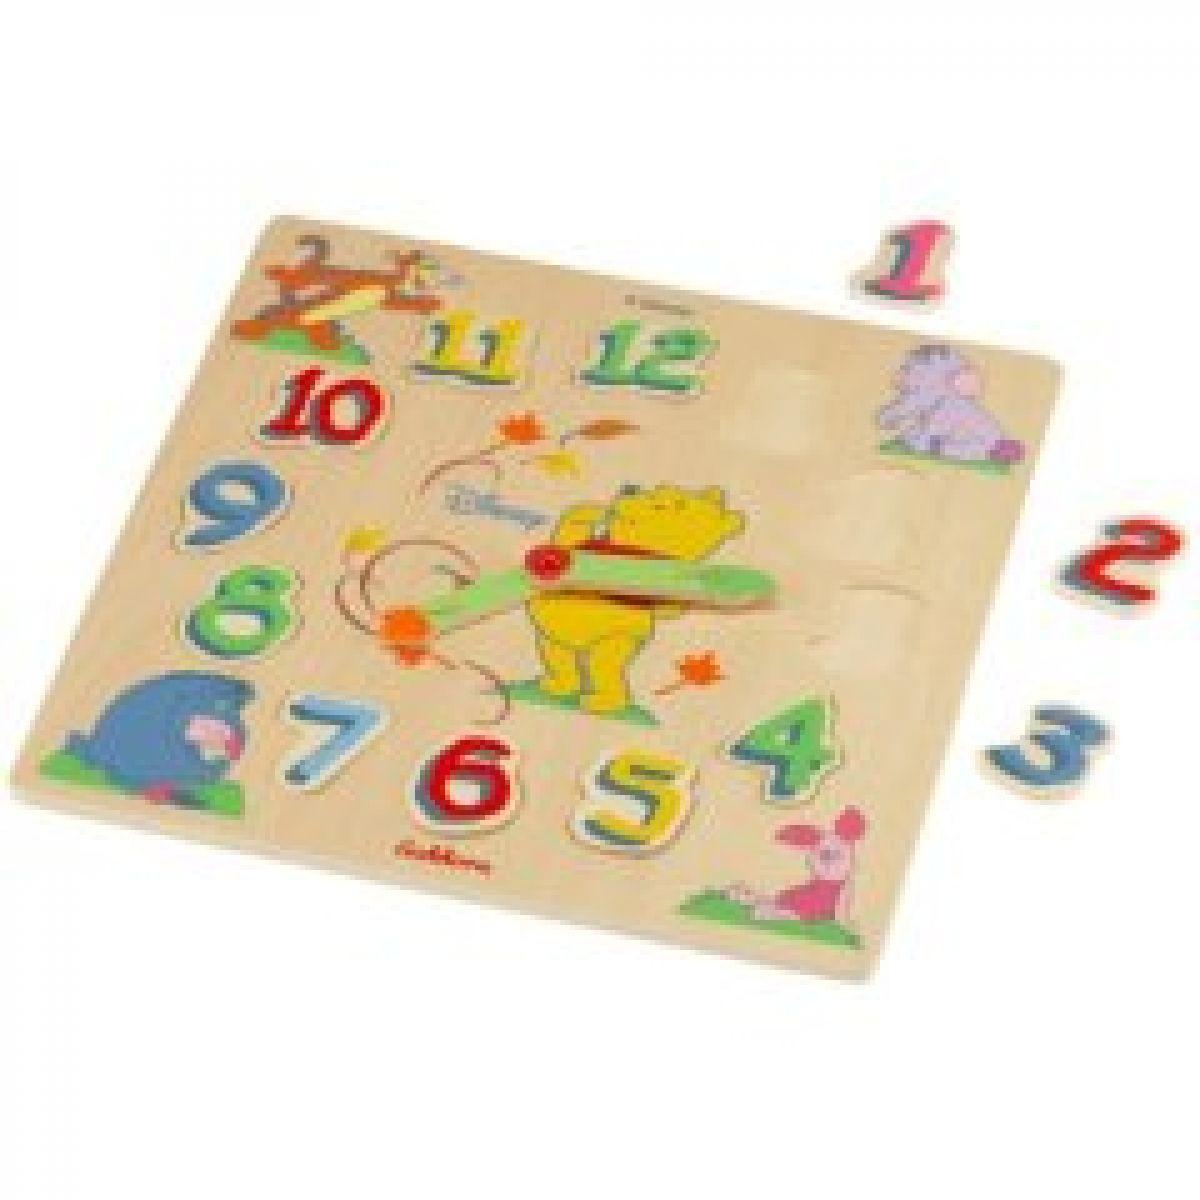 Puzzle dřevěné 30x30cm Medvídek Pú